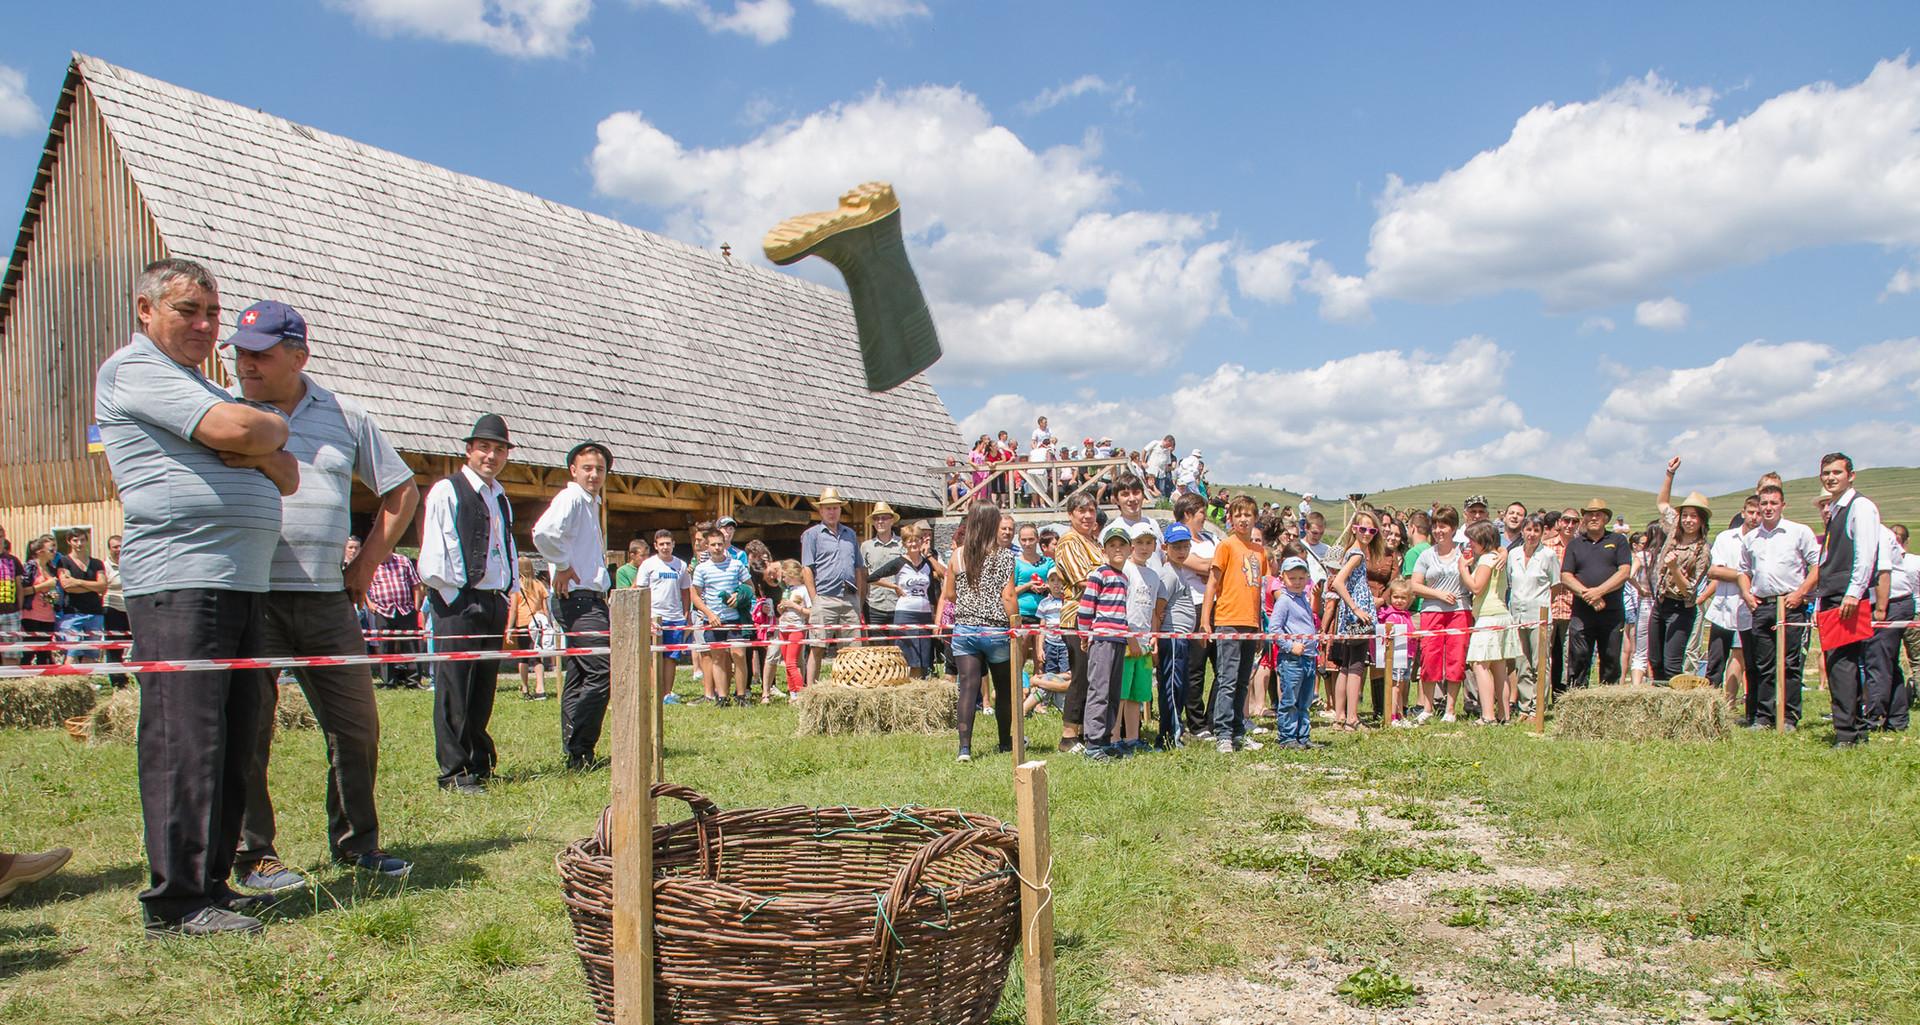 Csíkszenttamás / Tomeșt Harghita county / Hargita megye / Județul Harghita Romania / Románia / România 2015